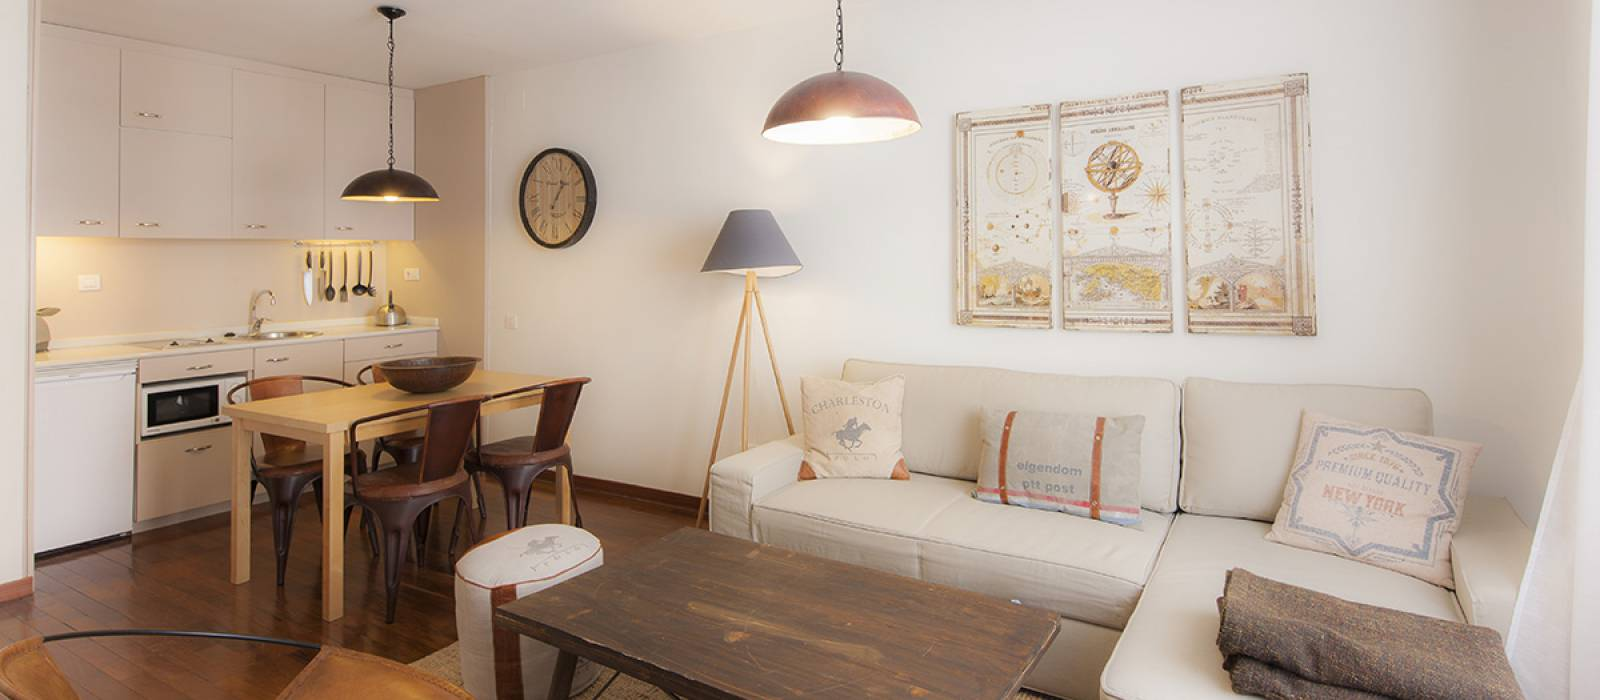 Soma Zimmer Hotel Vincci Madrid - Vincci Apartment